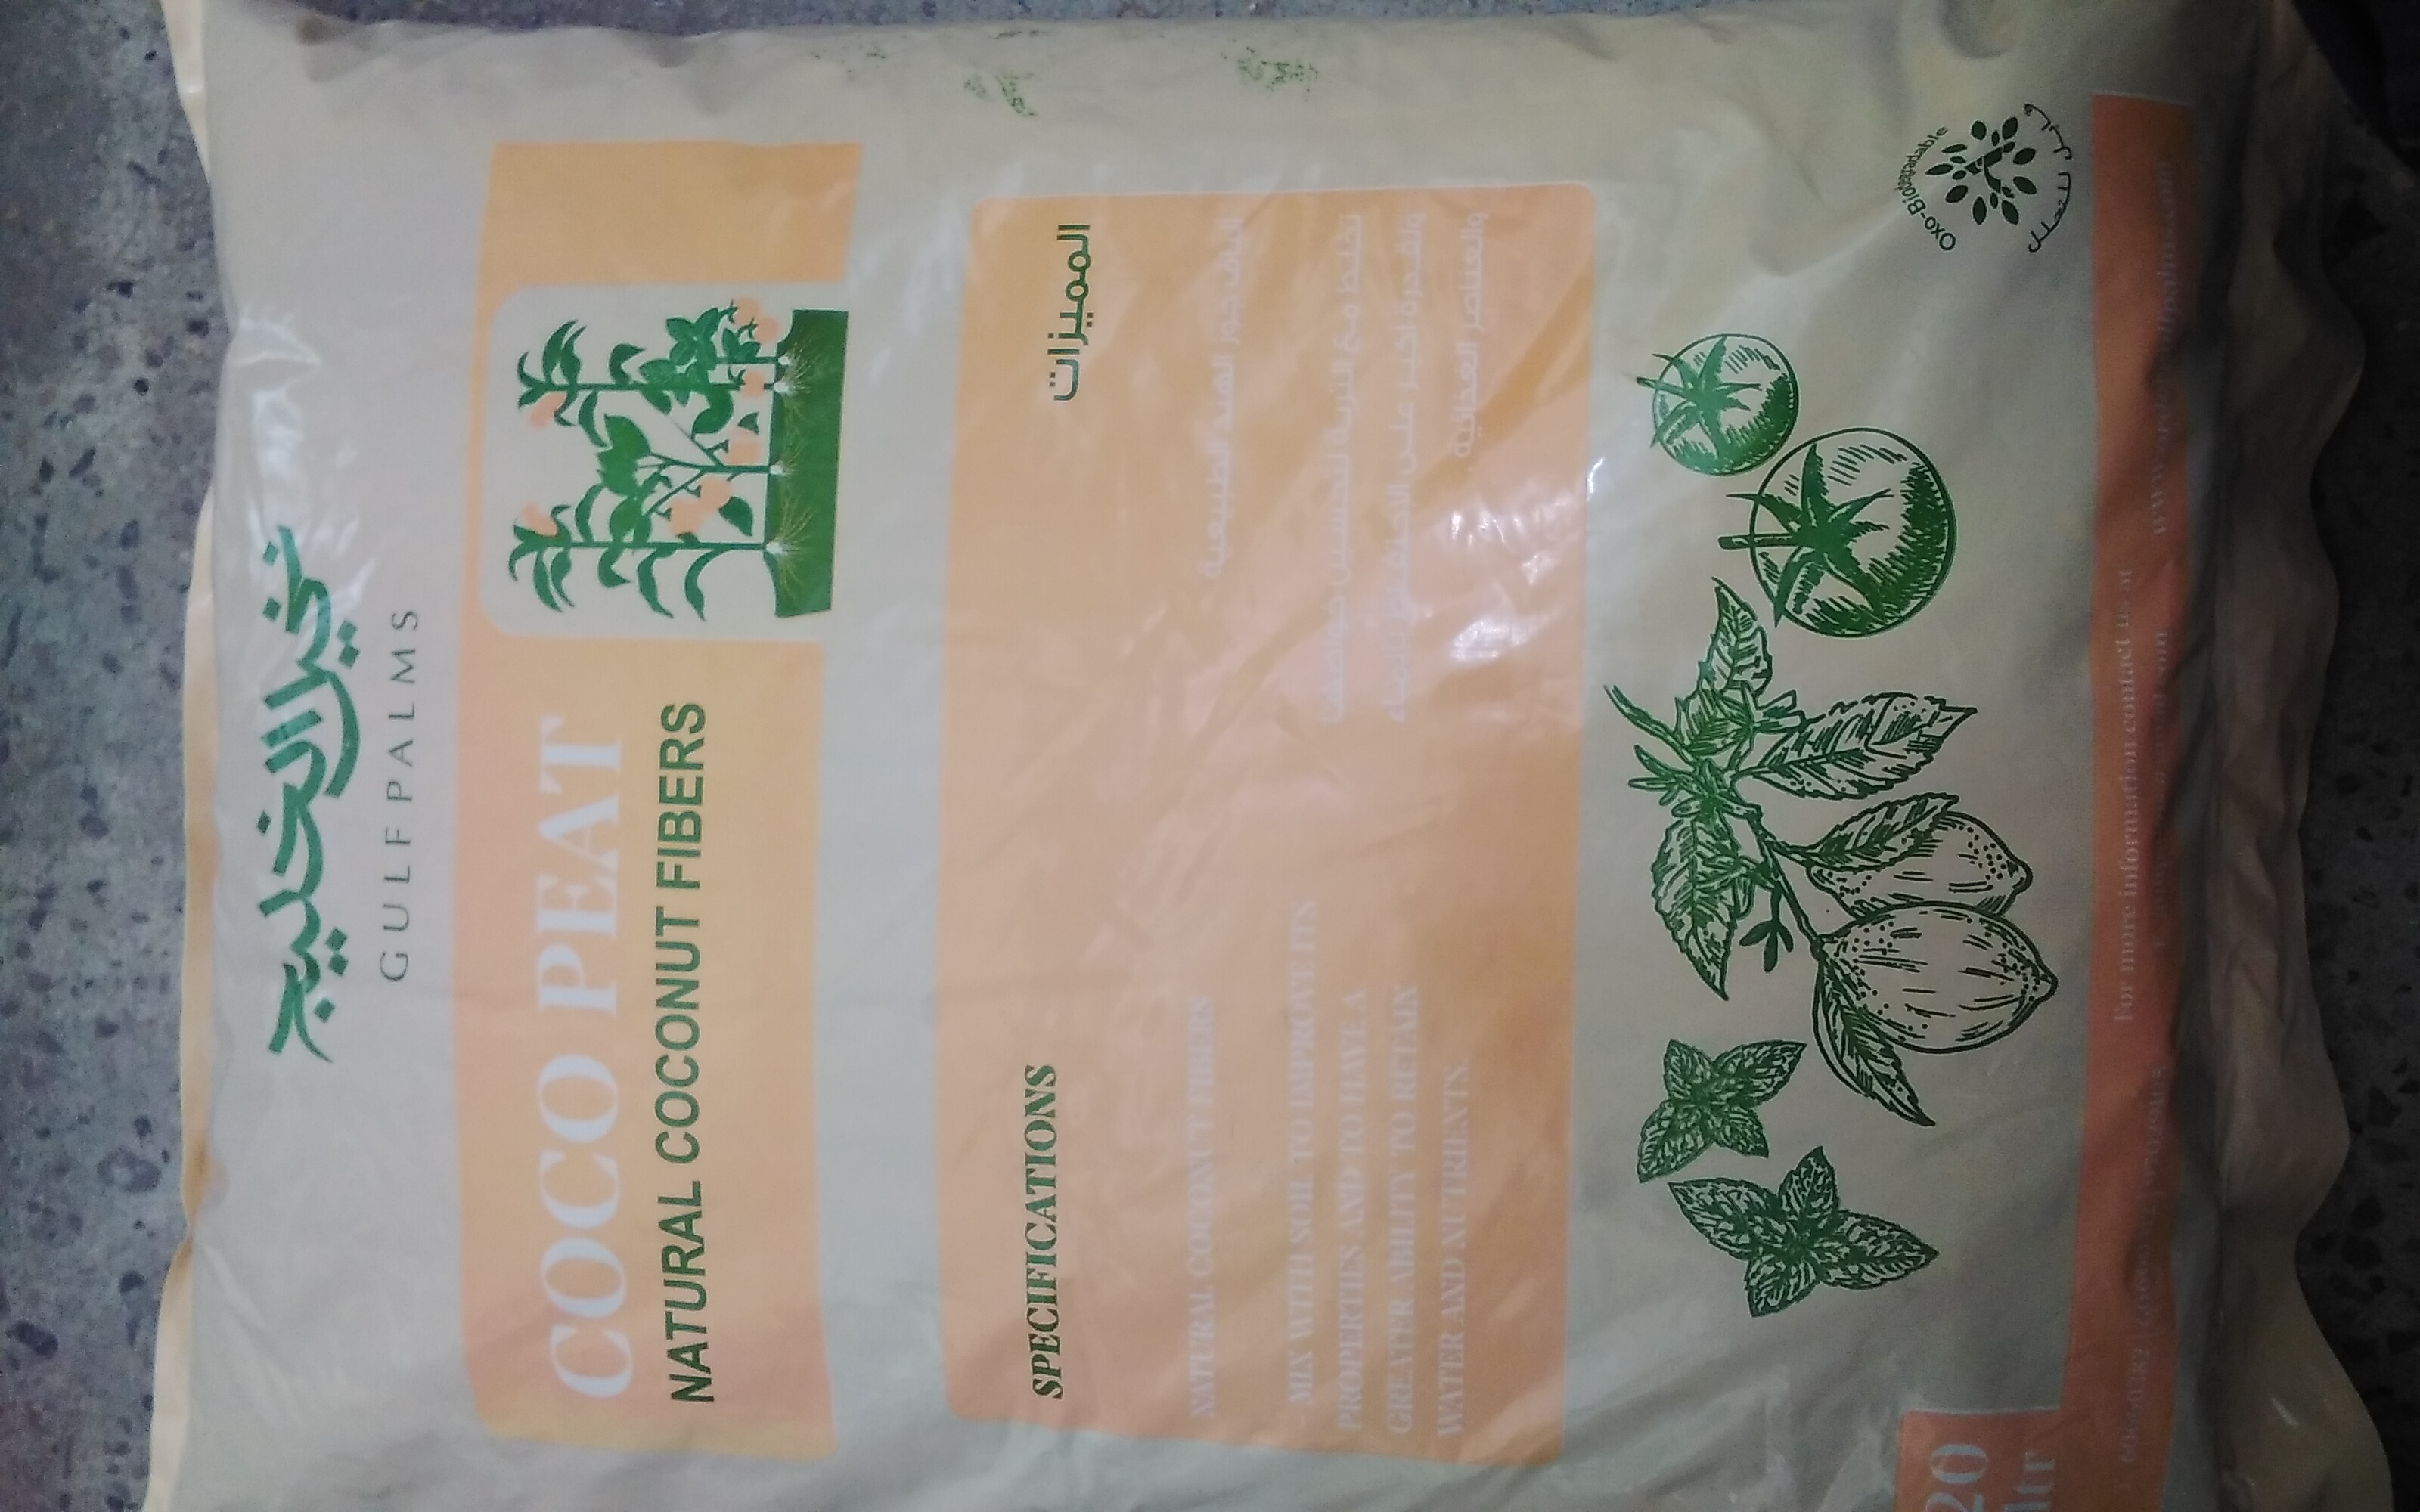 Coco Peat Soil Fertilizer Pesticide